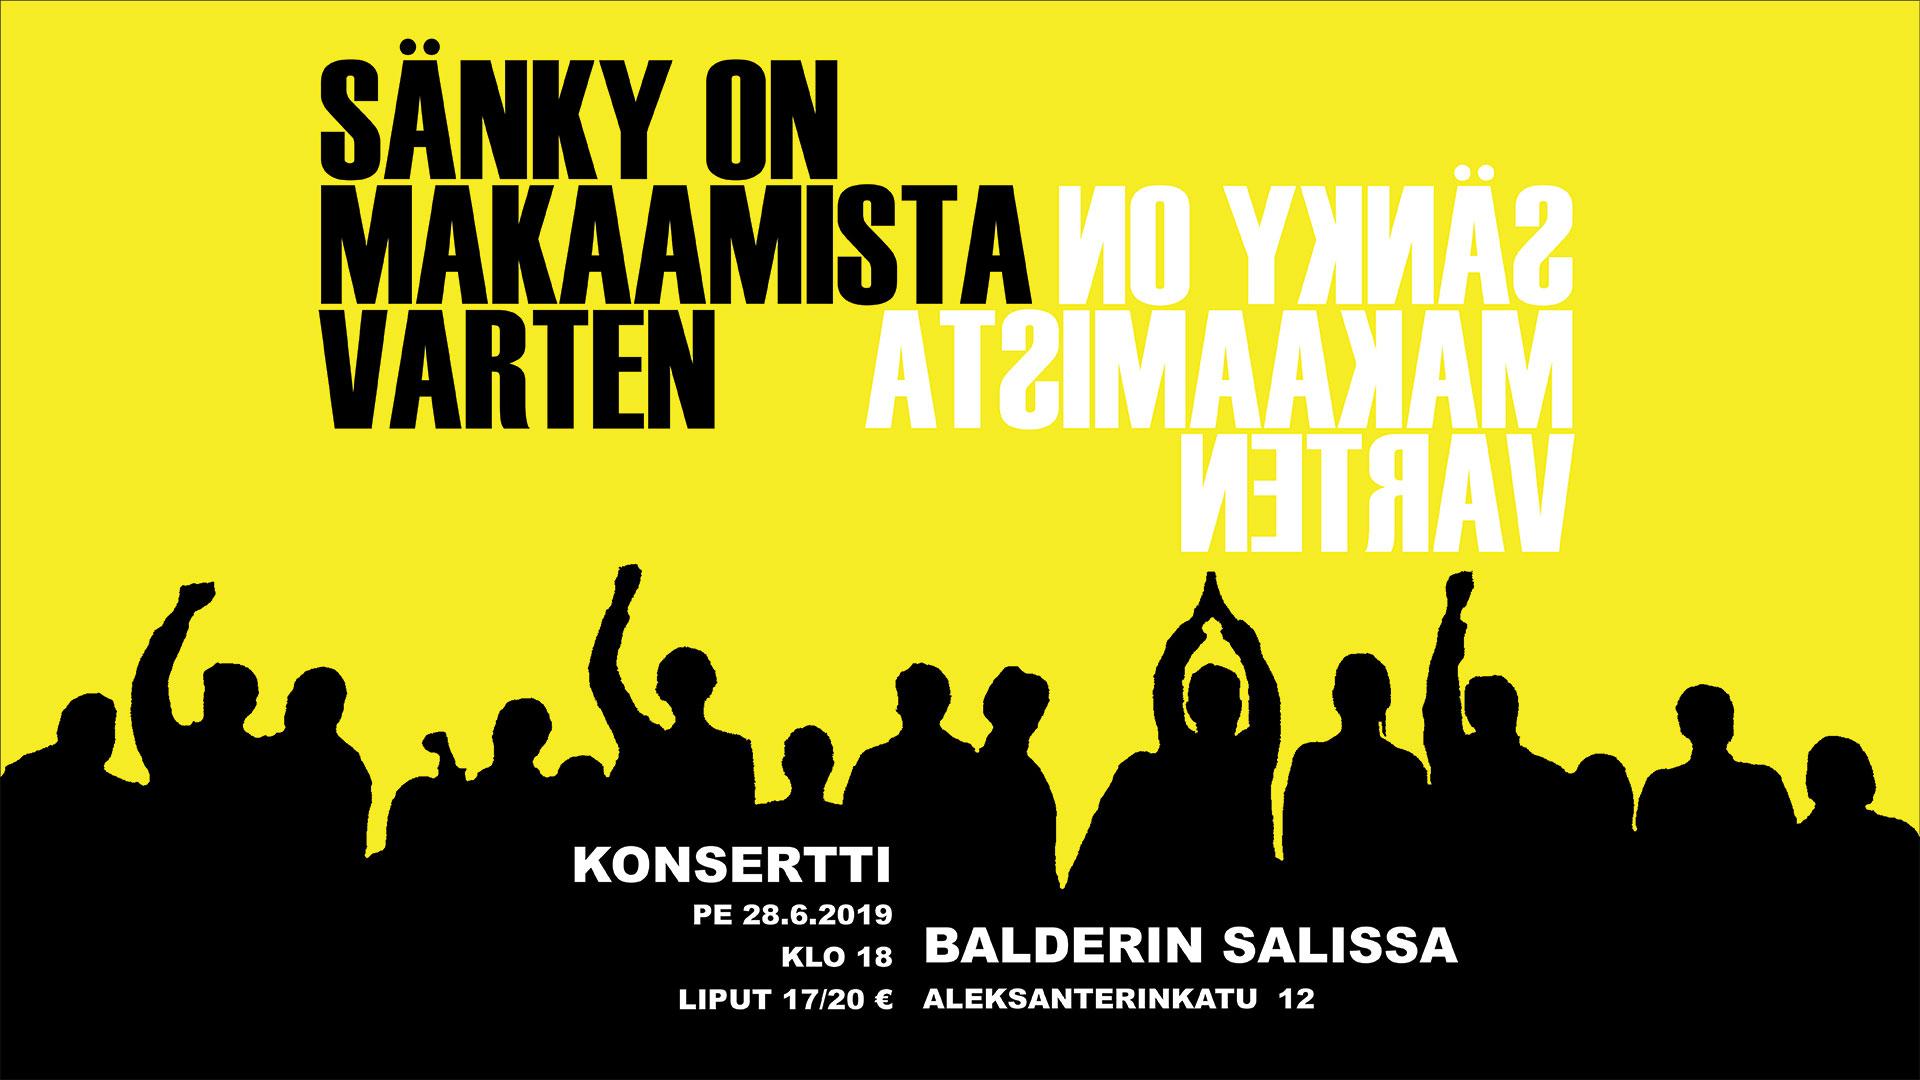 Link to event Lesbian Choir Kaupungin Naiset -concert